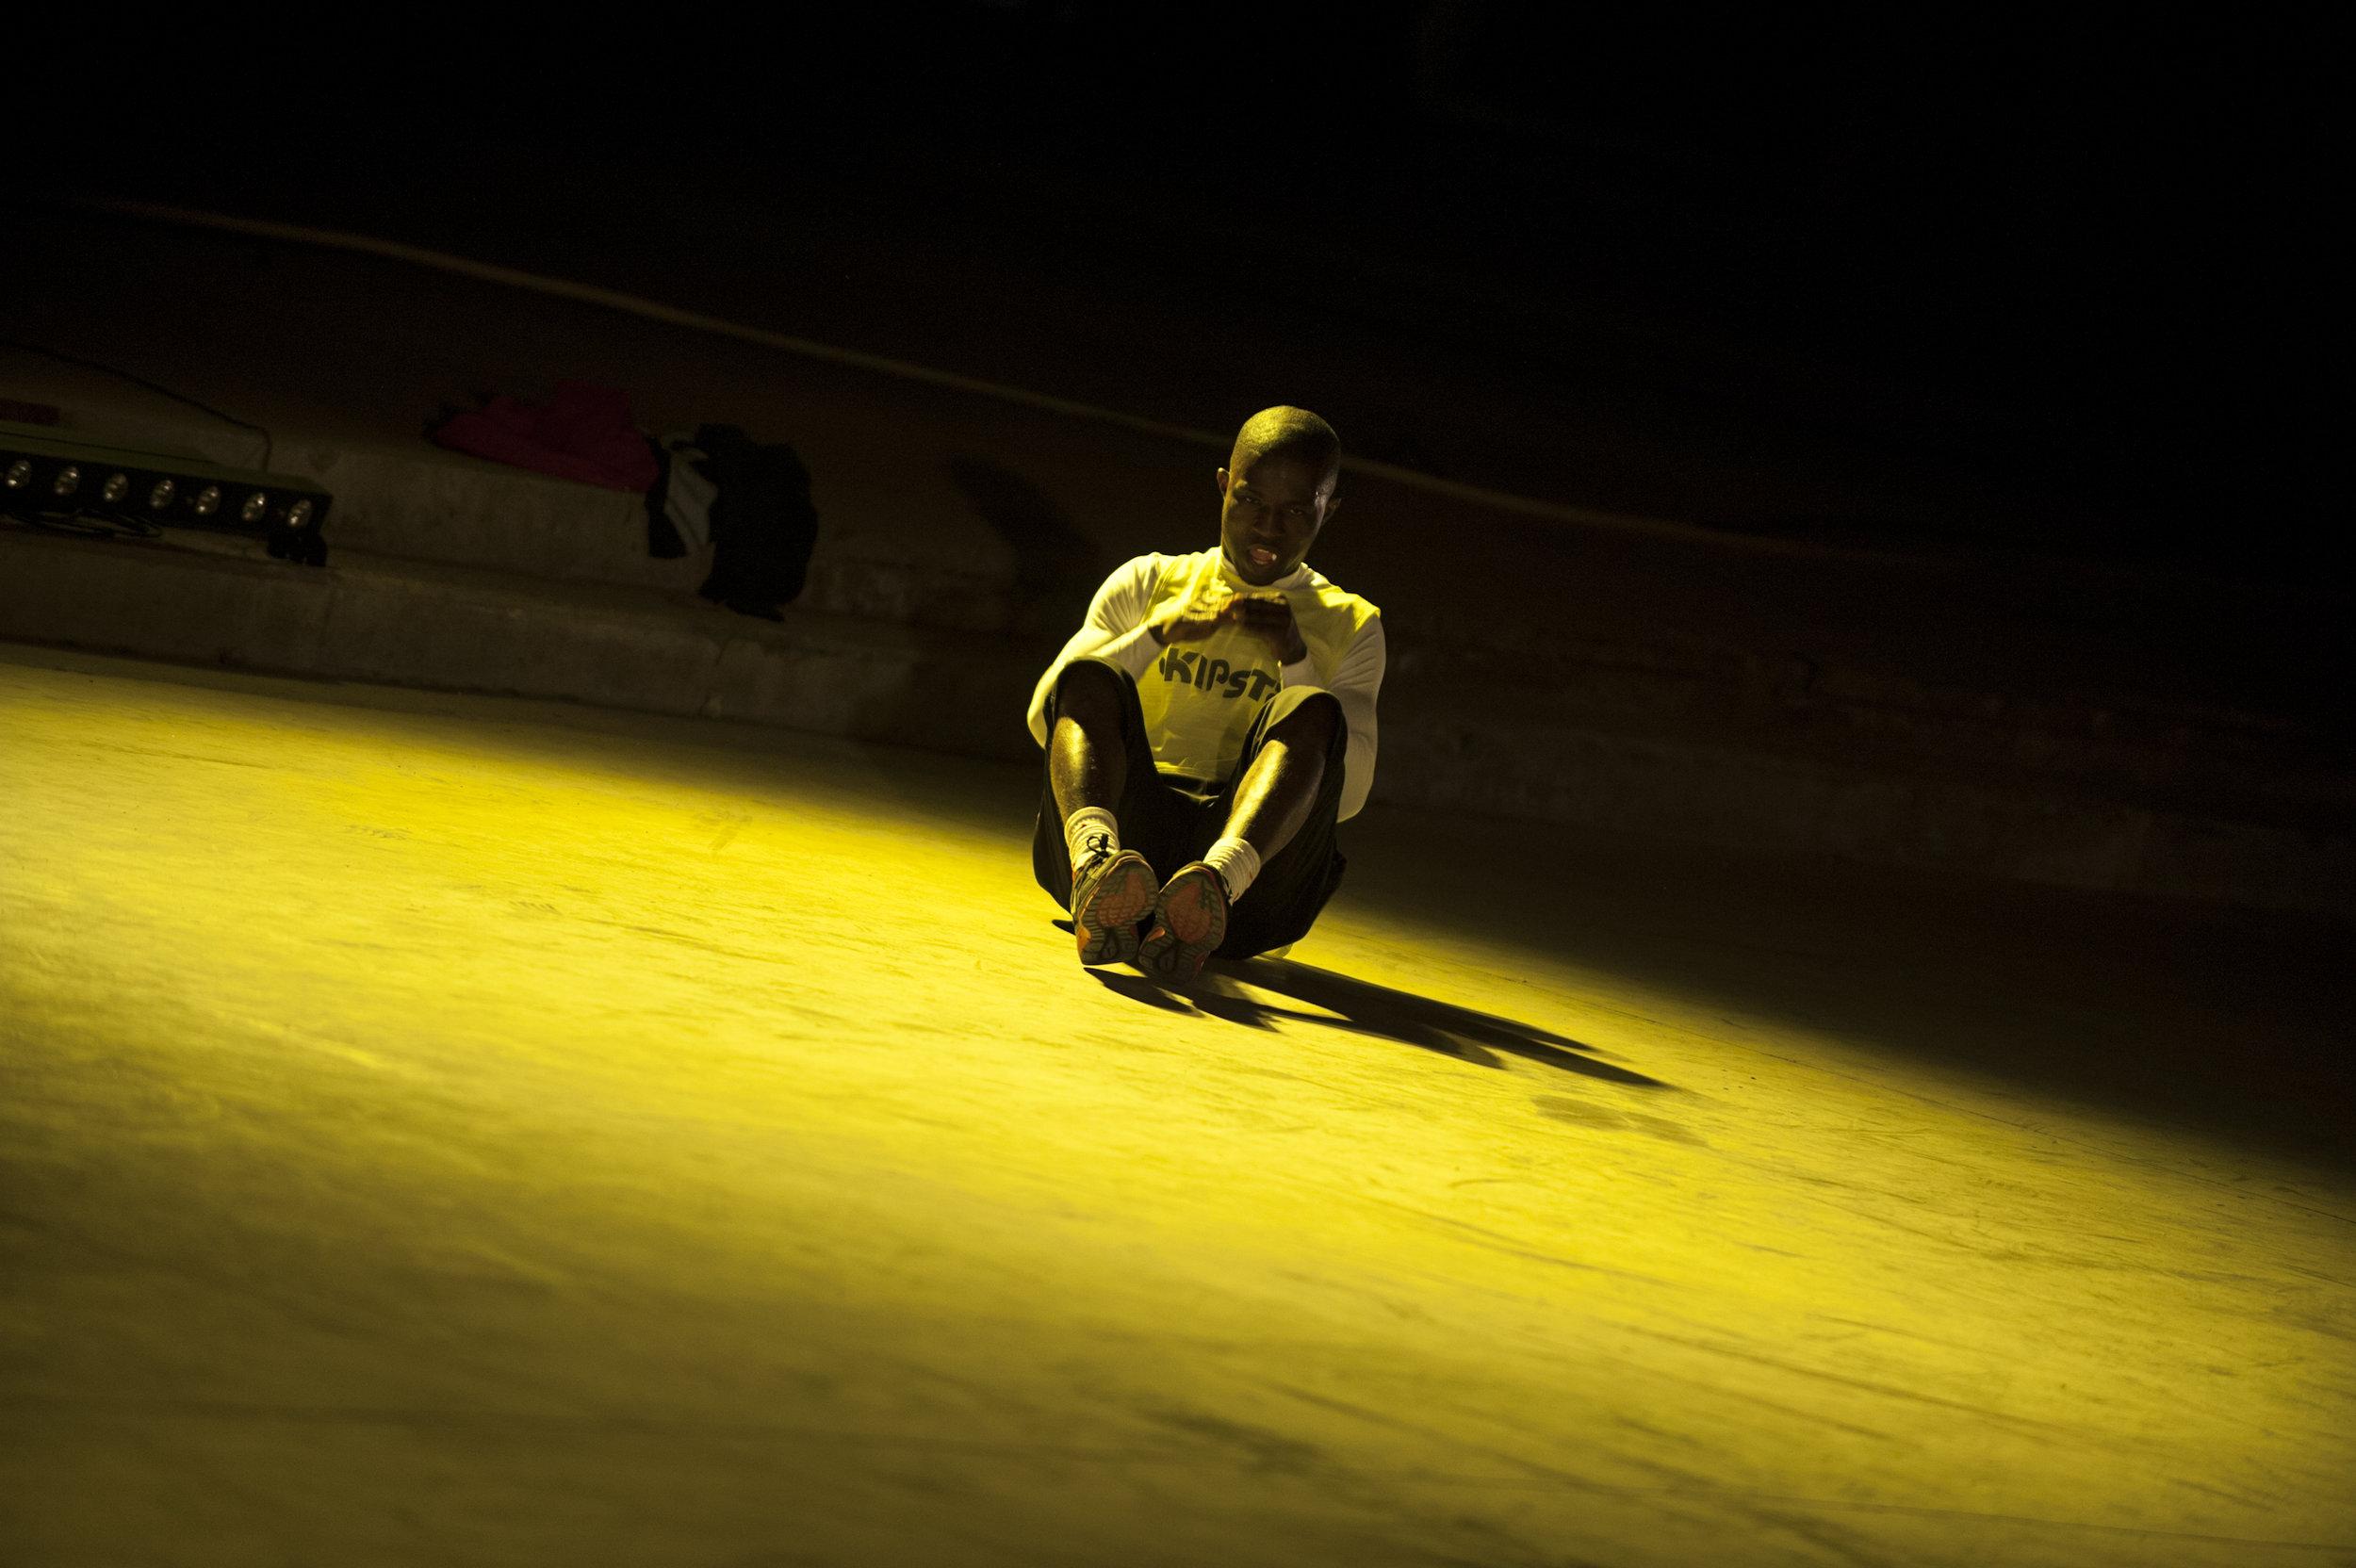 Michael Essien I Want To Play as You (2)_DSC8348_Paulien Verlackt_27.jpg